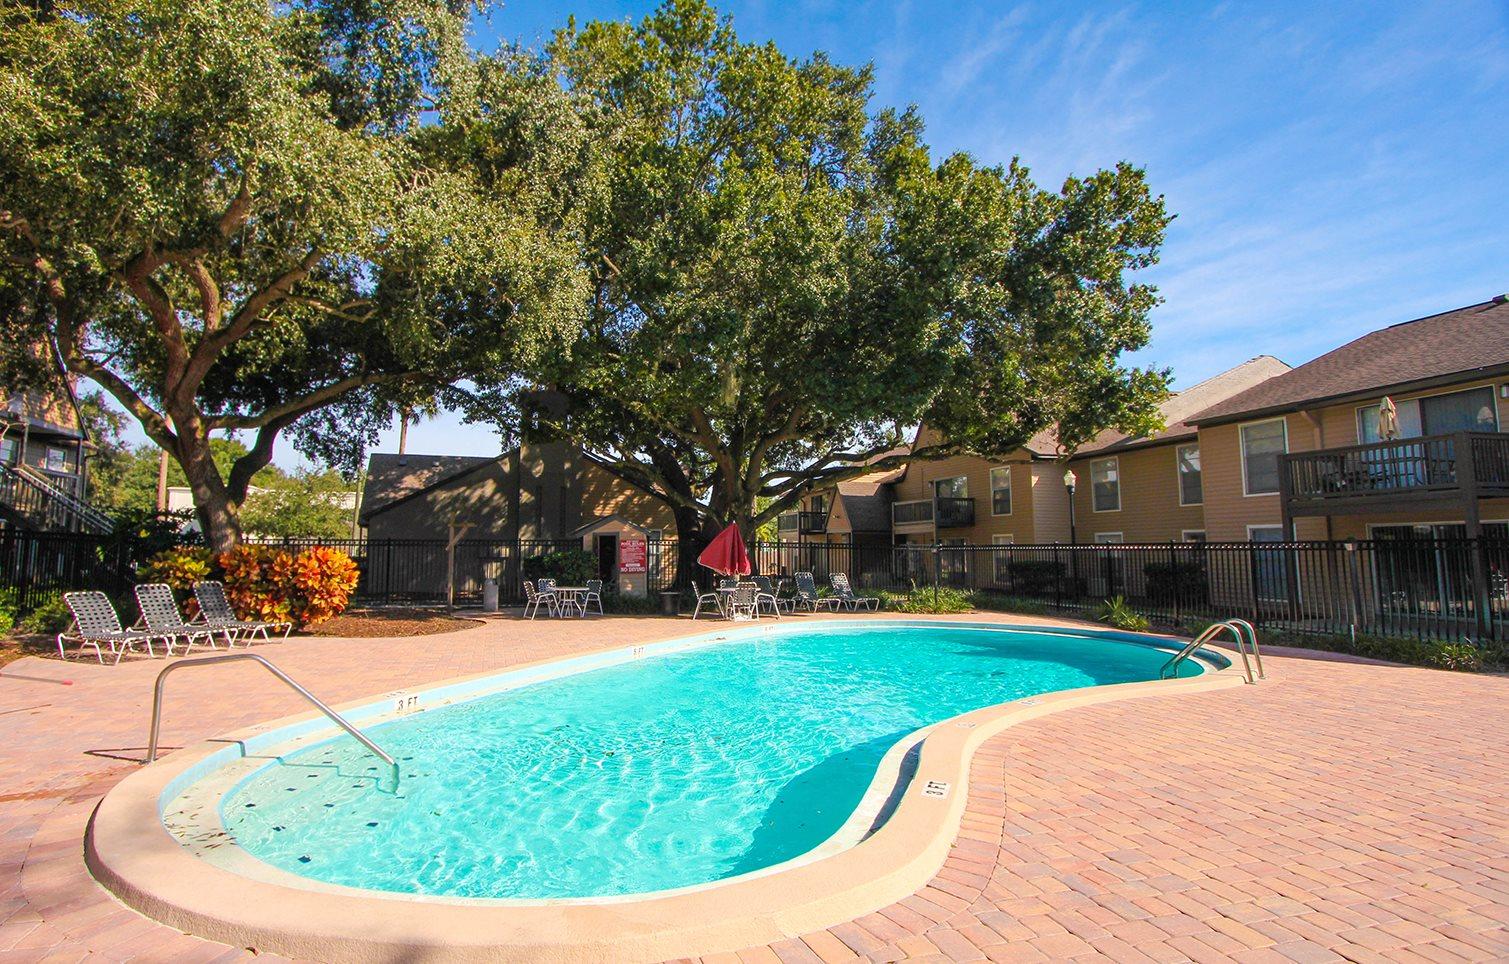 Miraculous Foxcroft Apartments In Tampa Fl Download Free Architecture Designs Scobabritishbridgeorg